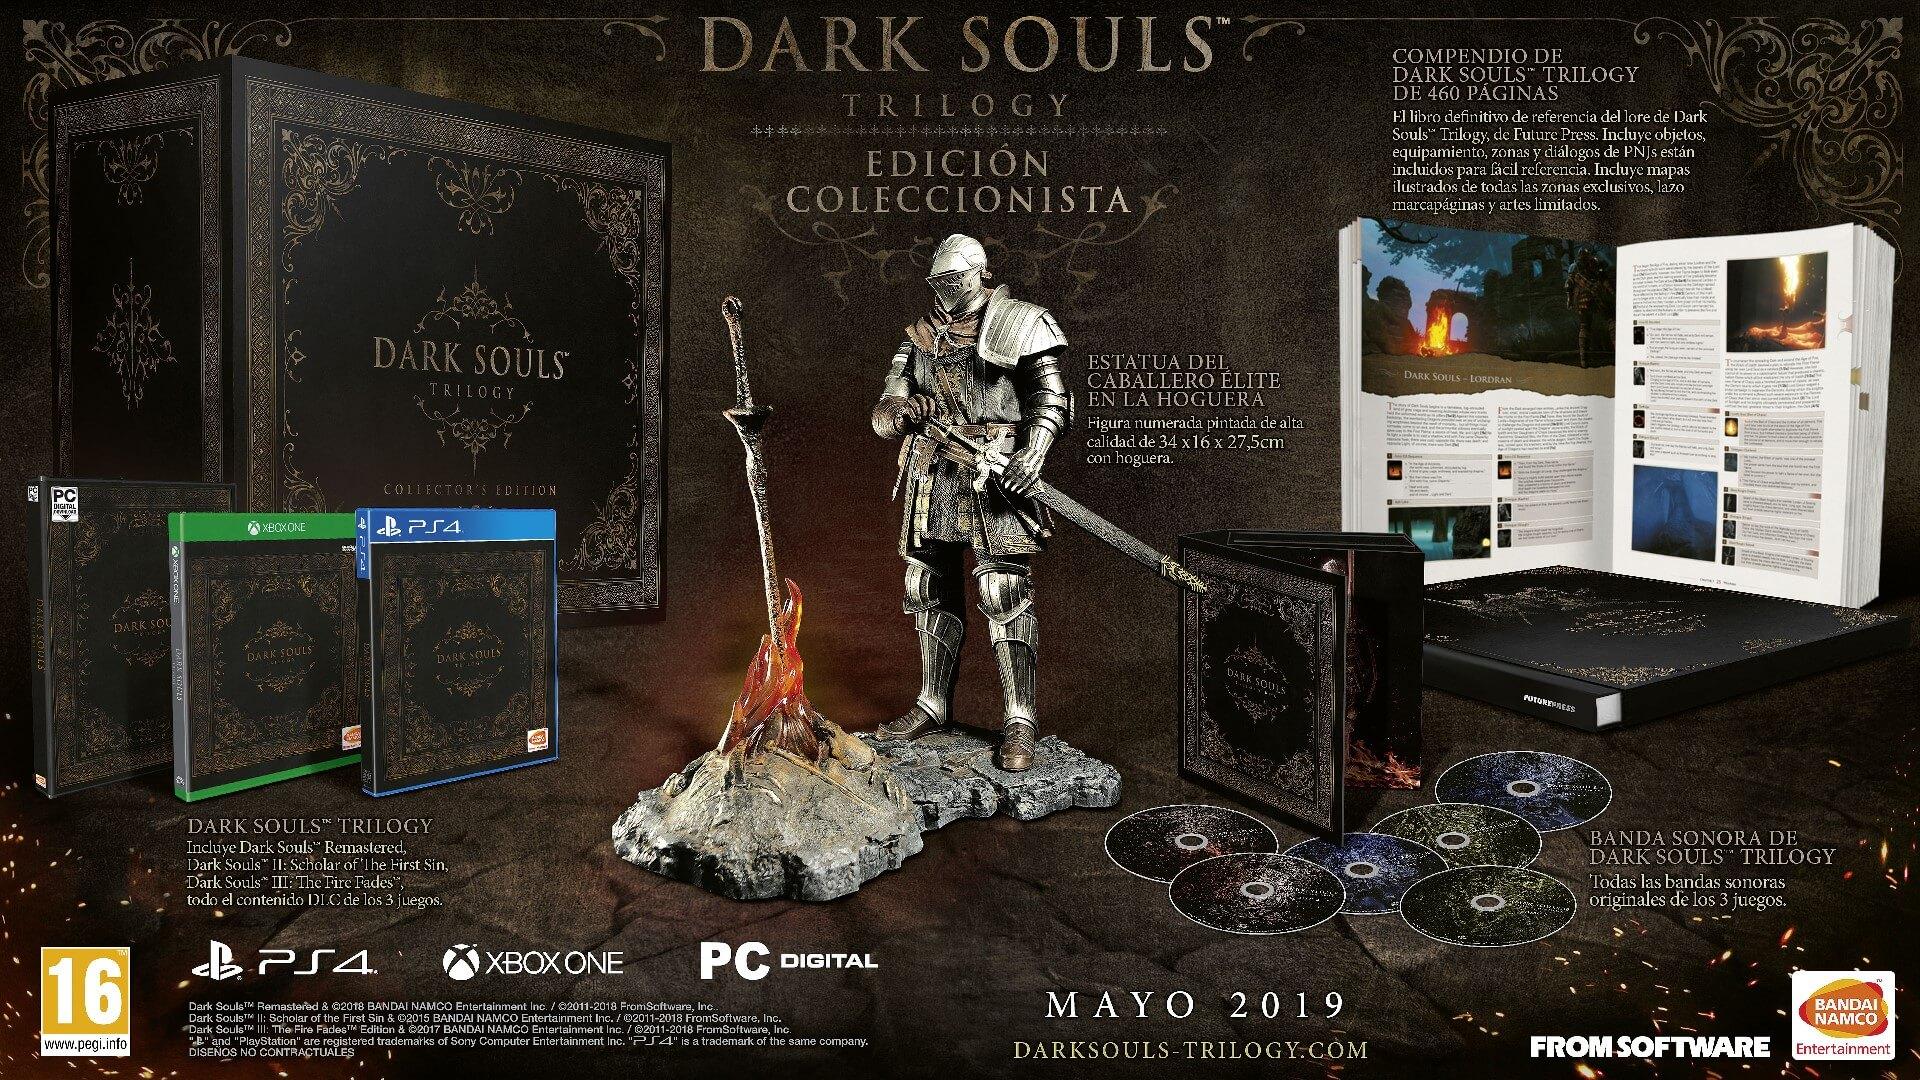 dark souls trilogy coleccionista